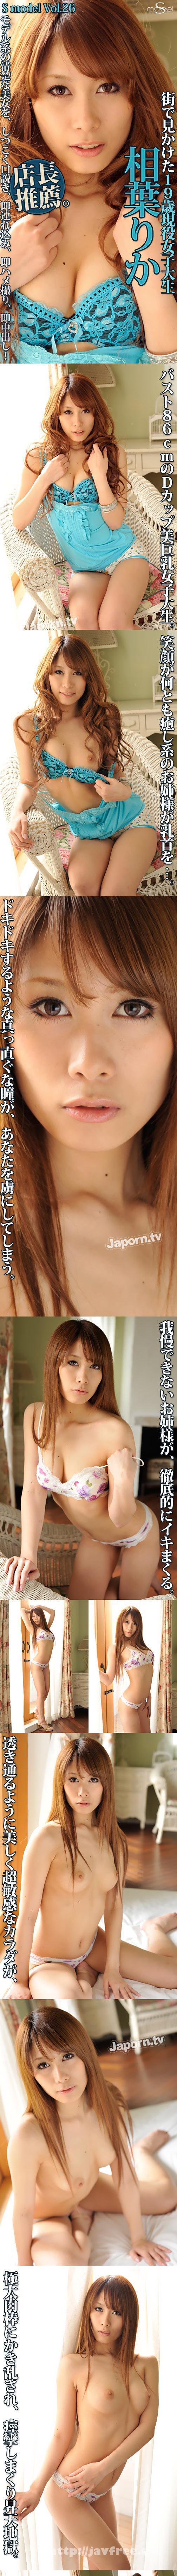 [SMD 26] S Model 26 : 相葉りか 相葉りか SMD Rika Aiba